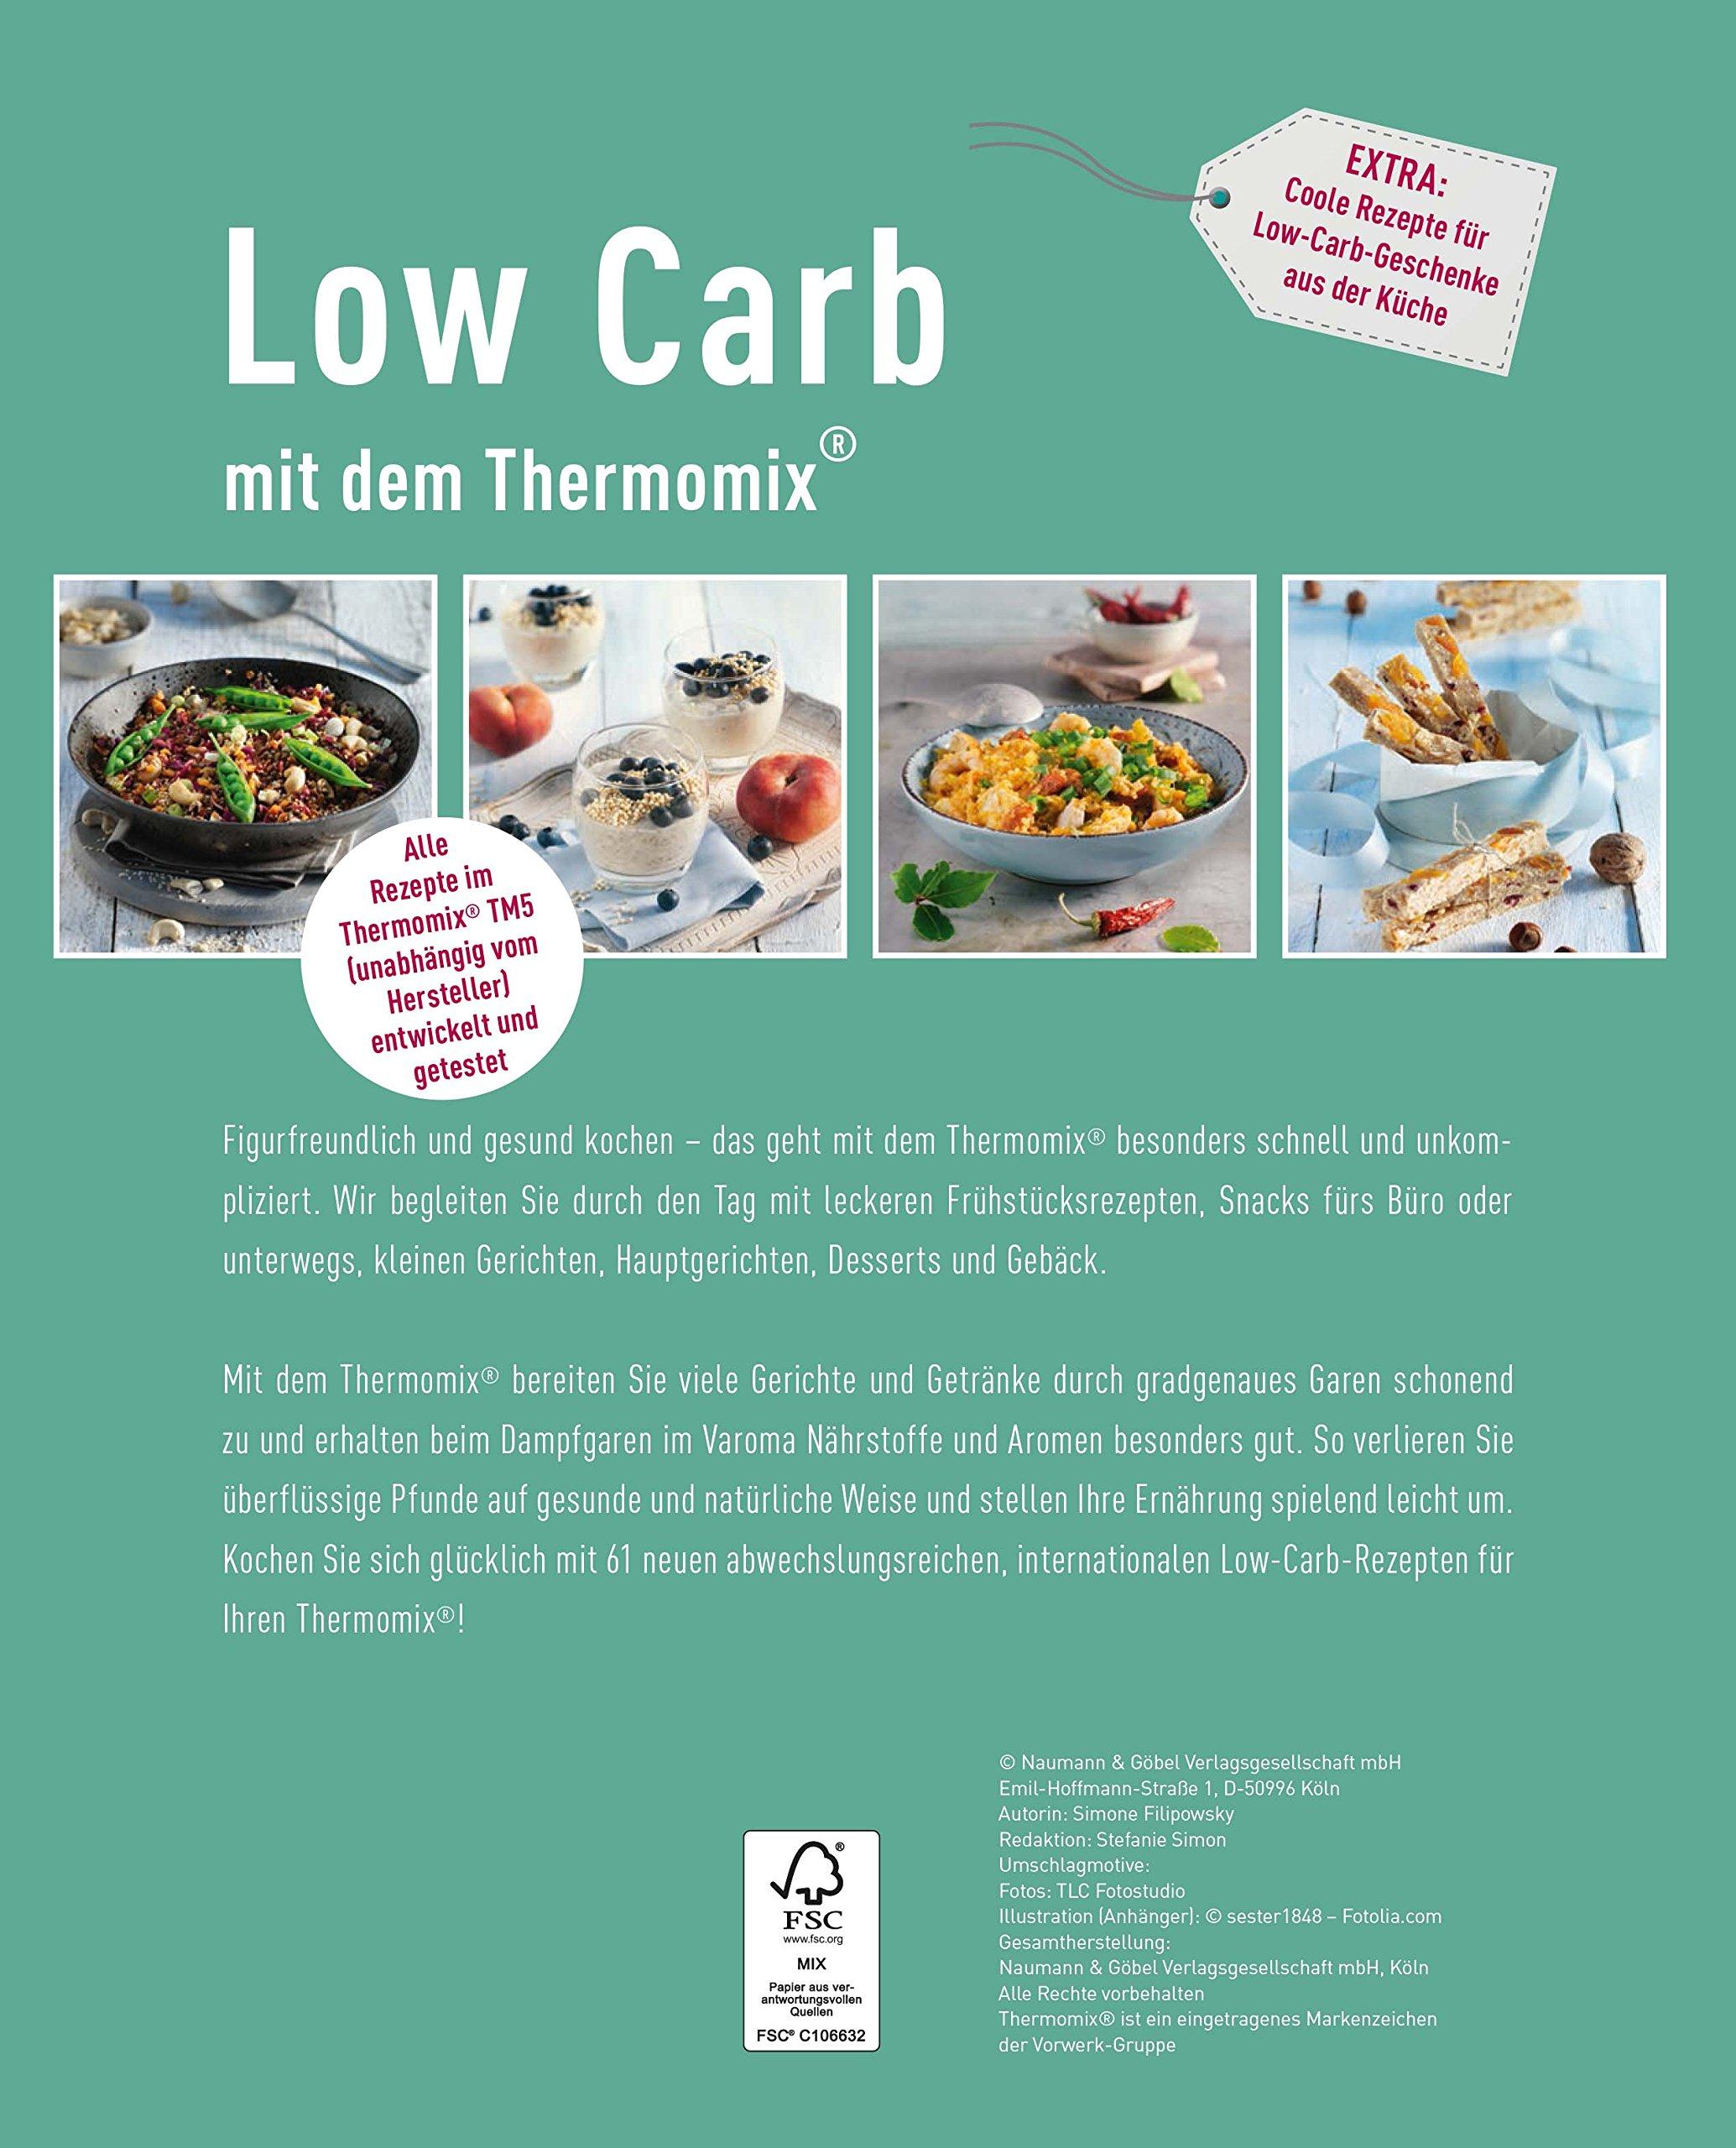 Low Carb mit dem Thermomix: Amazon.de: Simone Filipowsky: Bücher